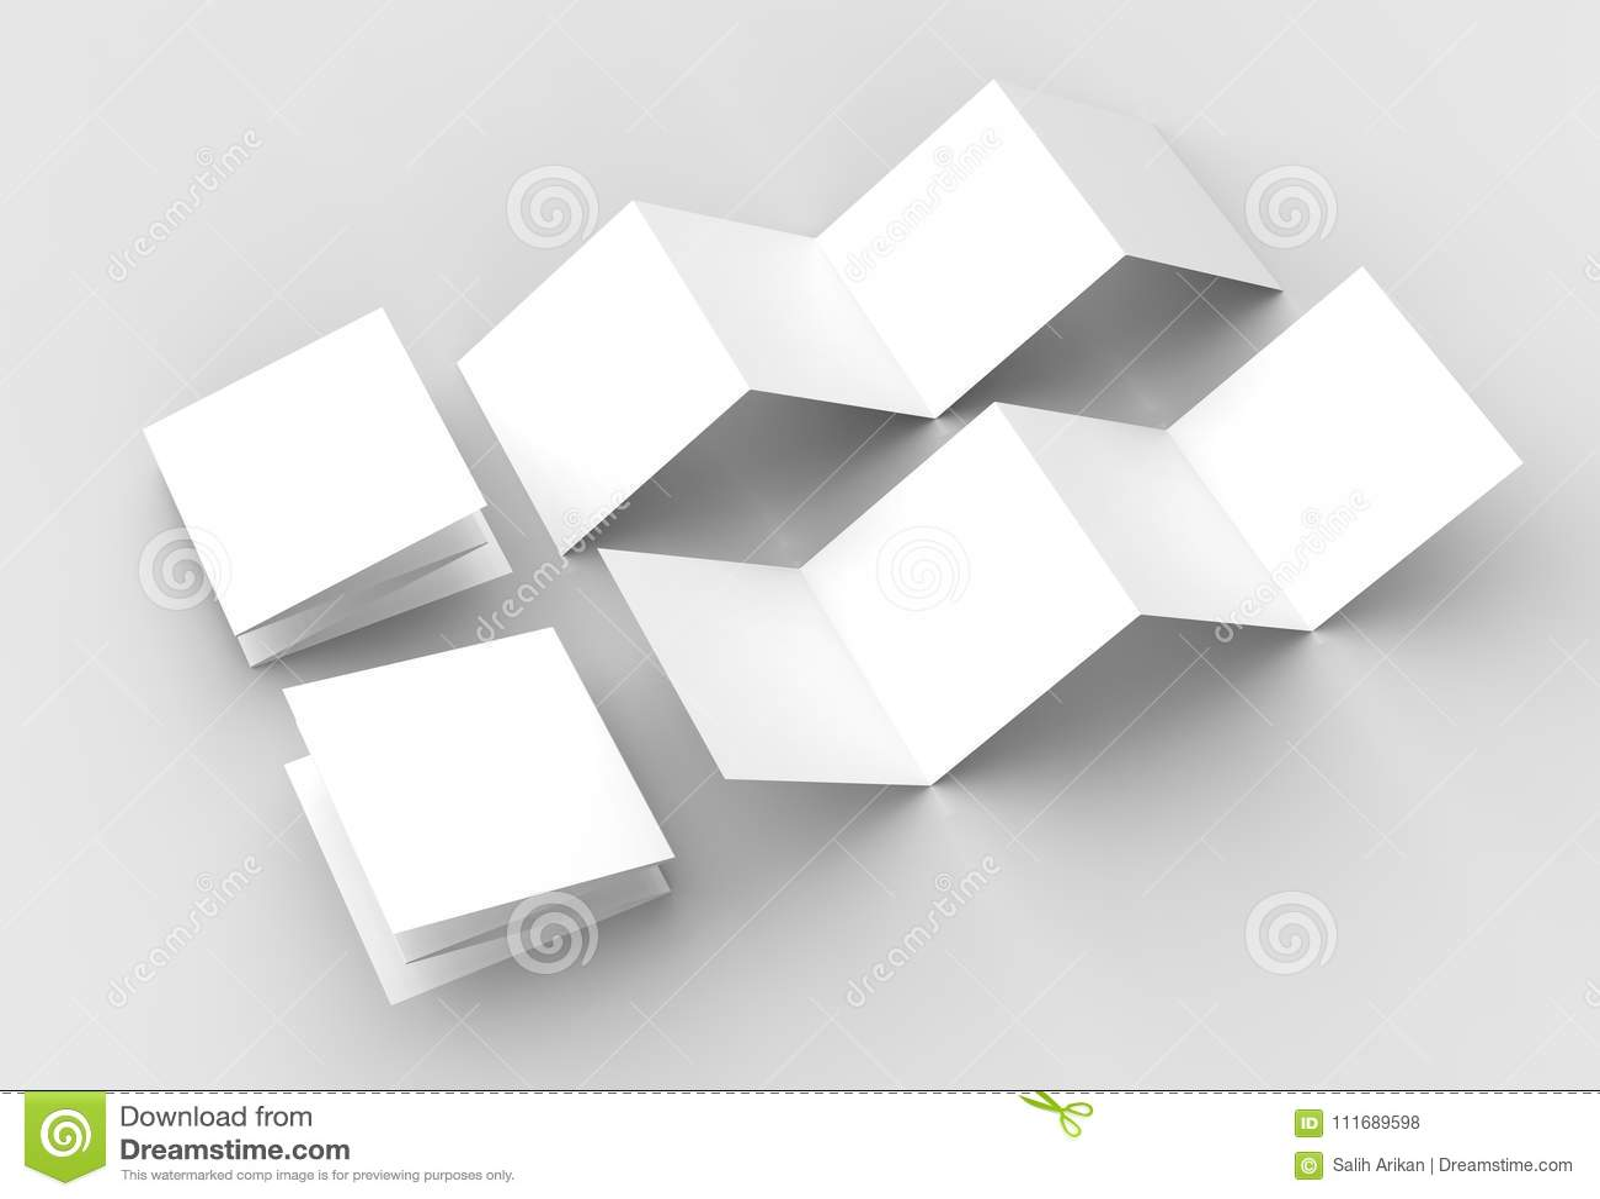 8 page leaflet, 4 panel accordion fold square brochure mock up i